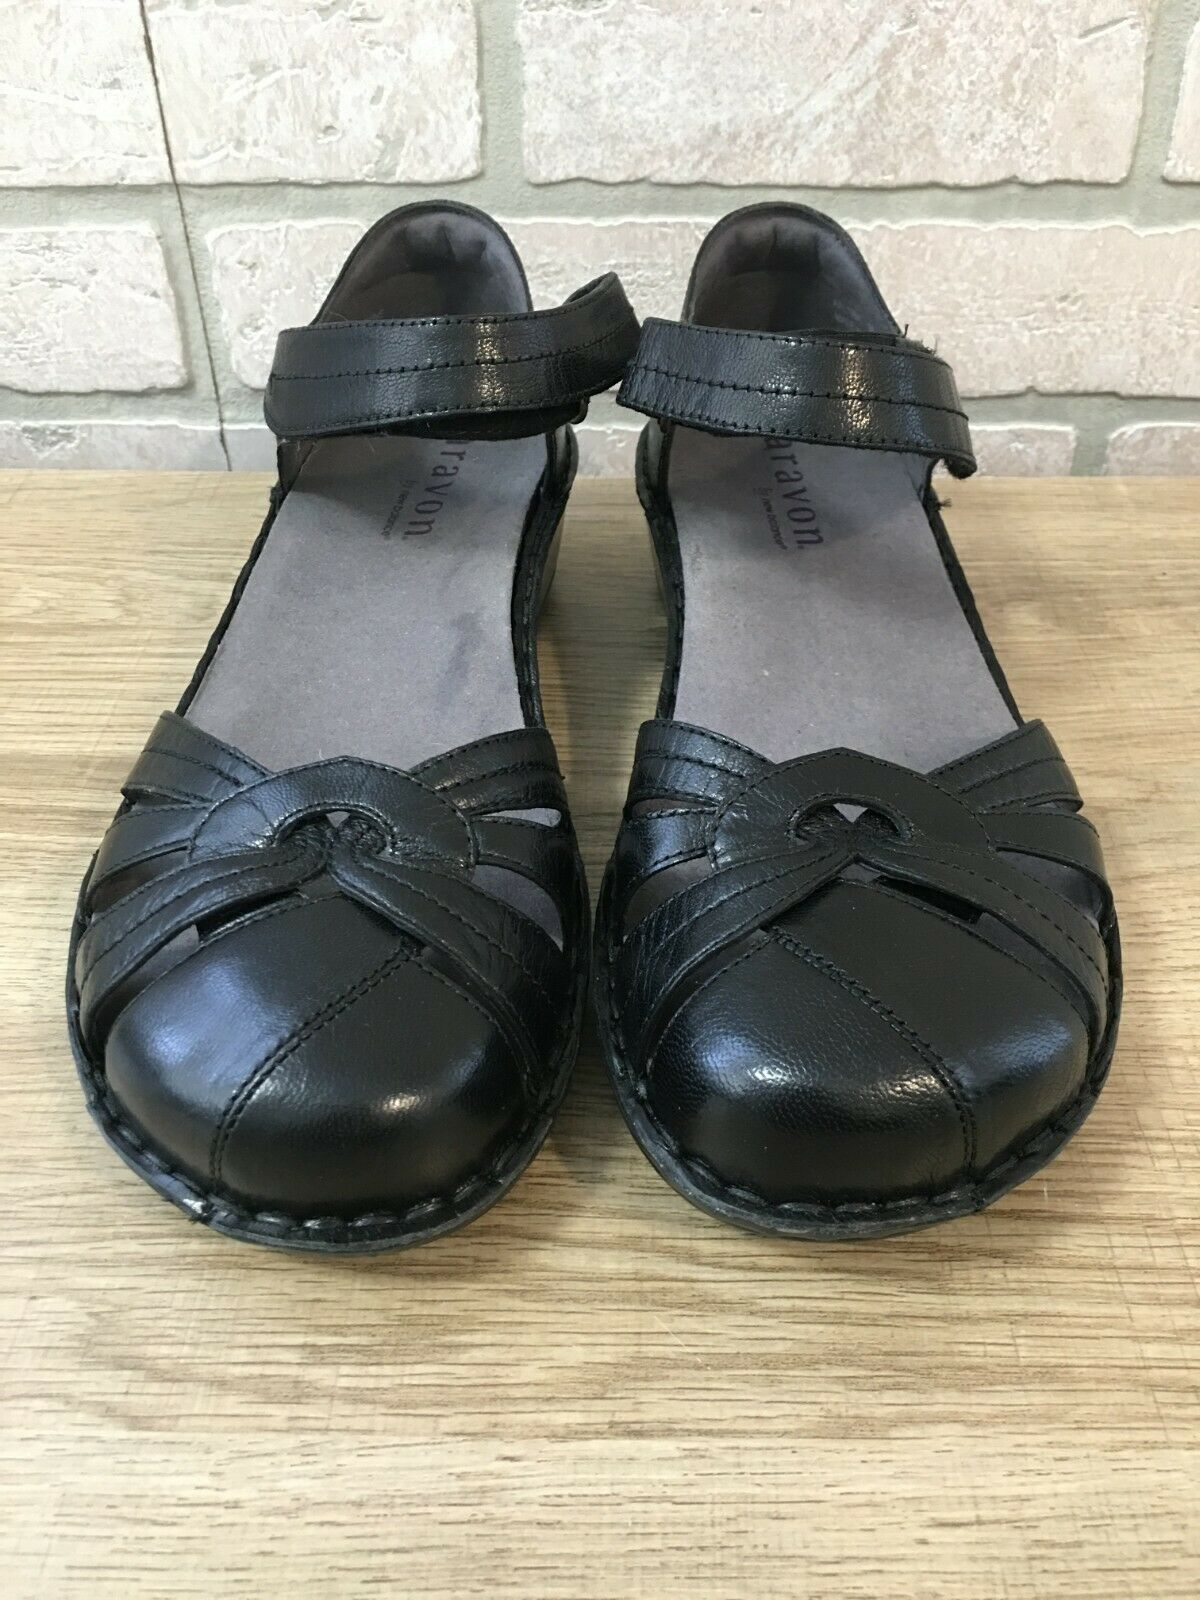 NEW BALANCE ARAVON AAL10BK Clarissa Black Leather Sandal Shoes Women's US 9B